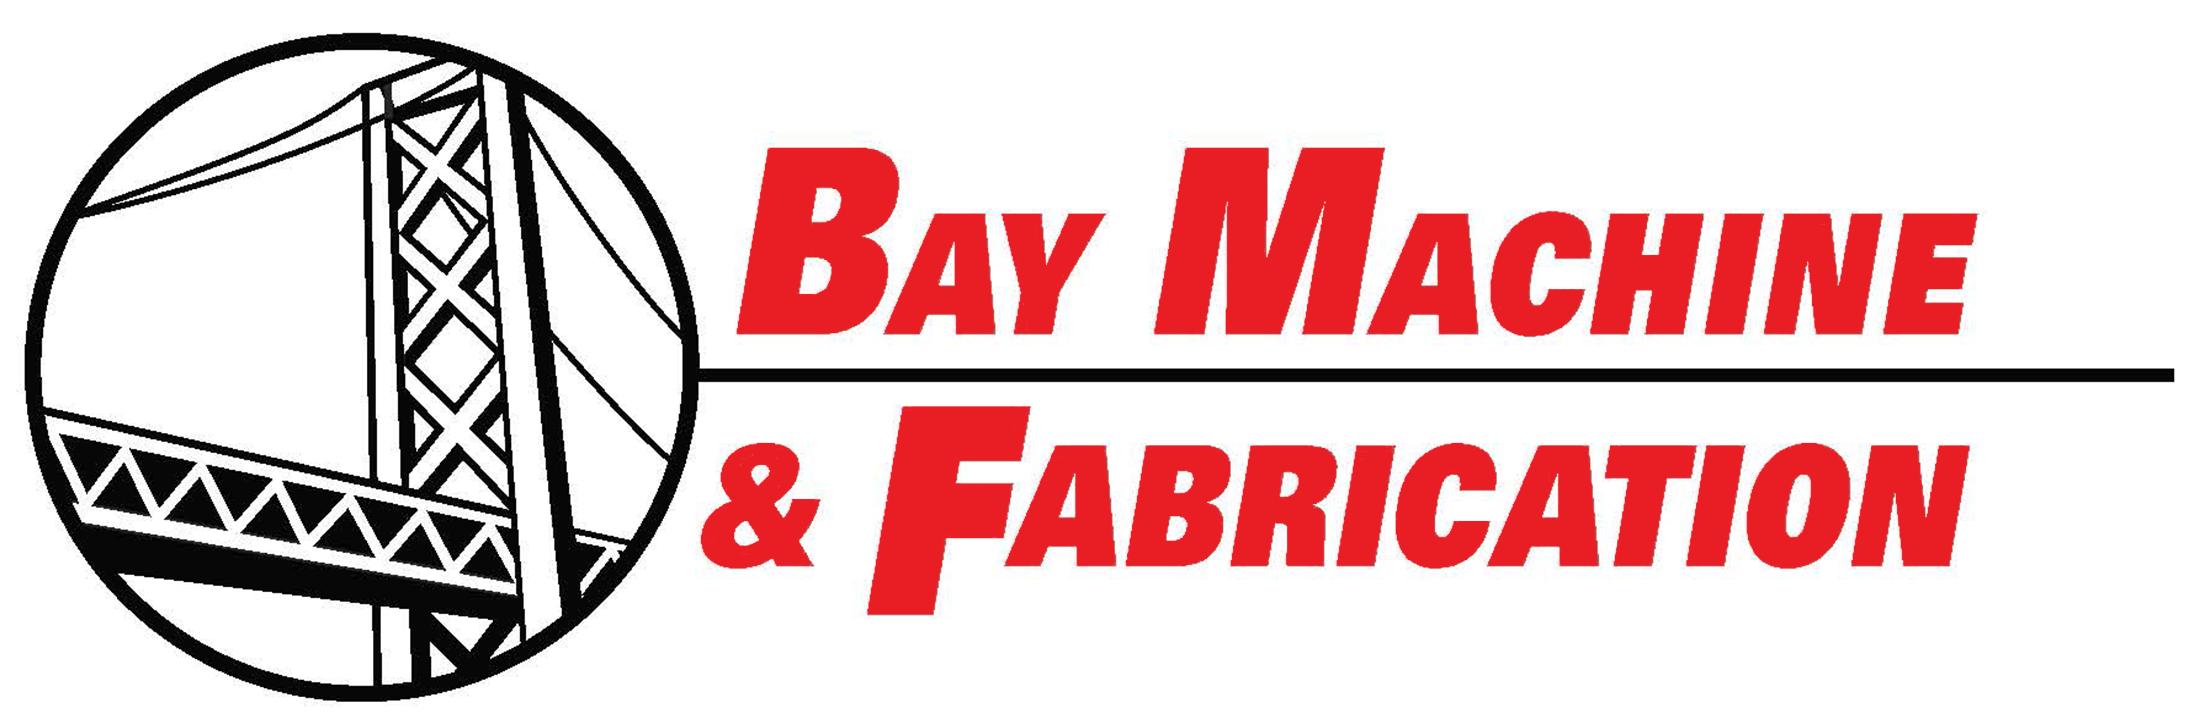 Bay Machine and Fabrication